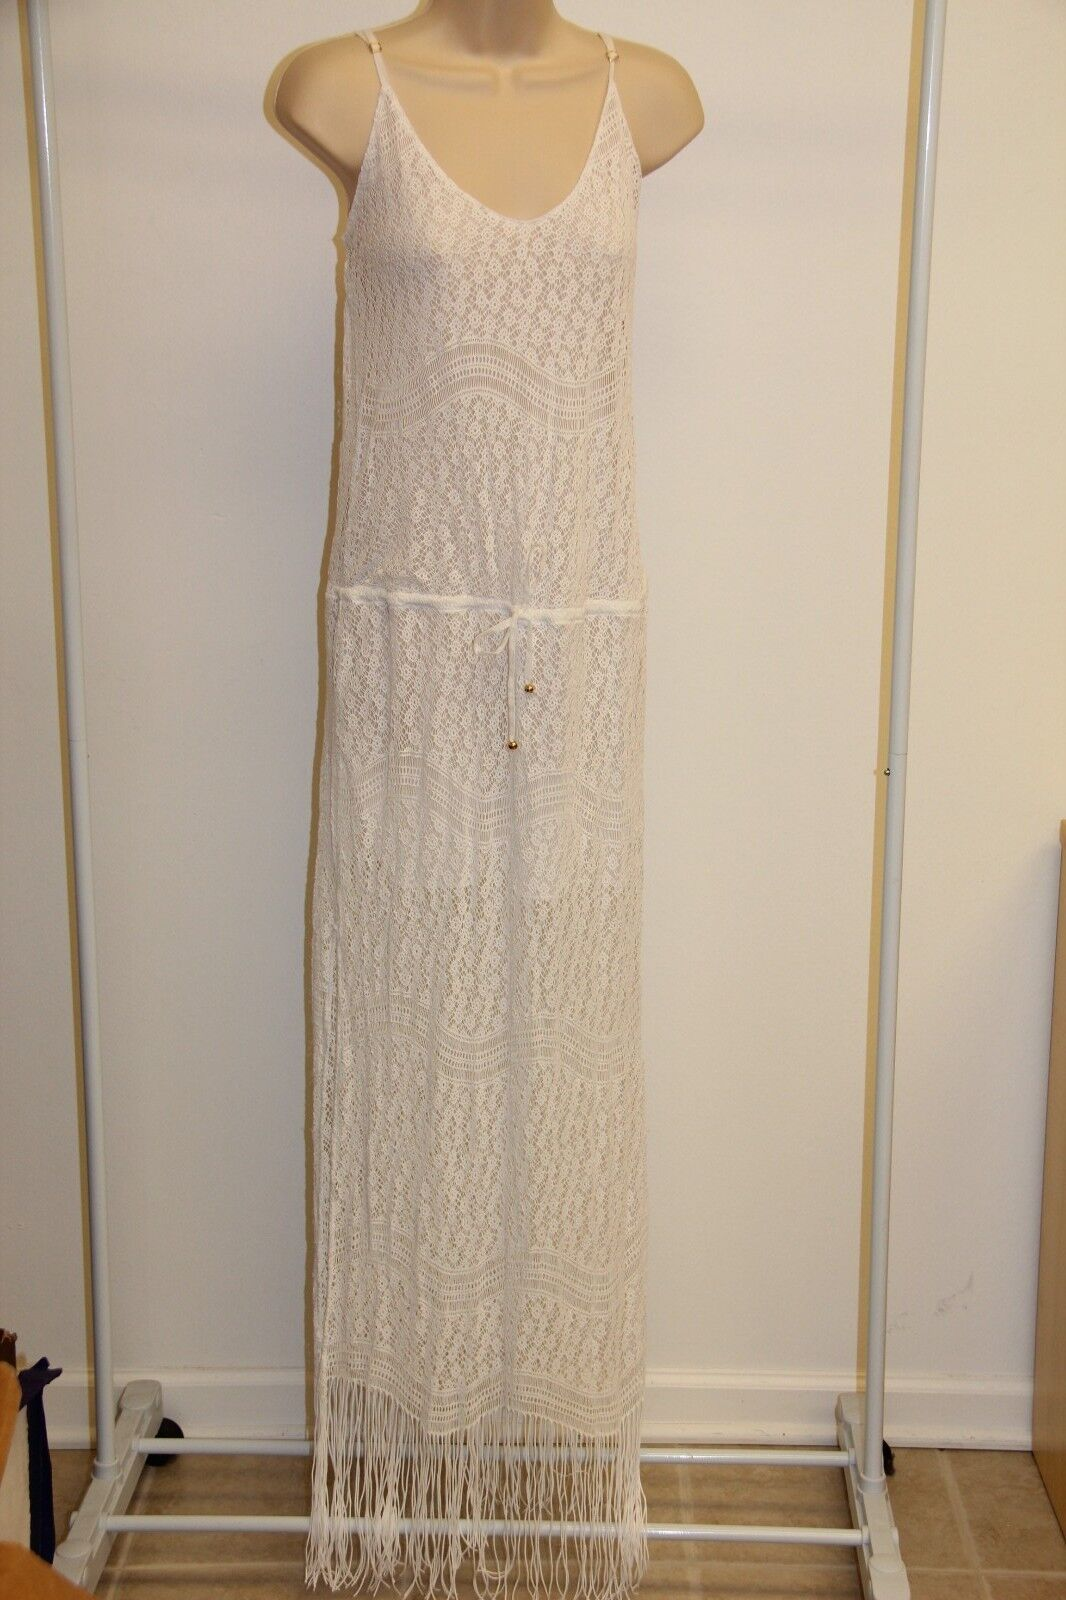 NWT PILYQ Barcelona Swimsuit Bikini Cover Up Maxi Dress Sz M L White